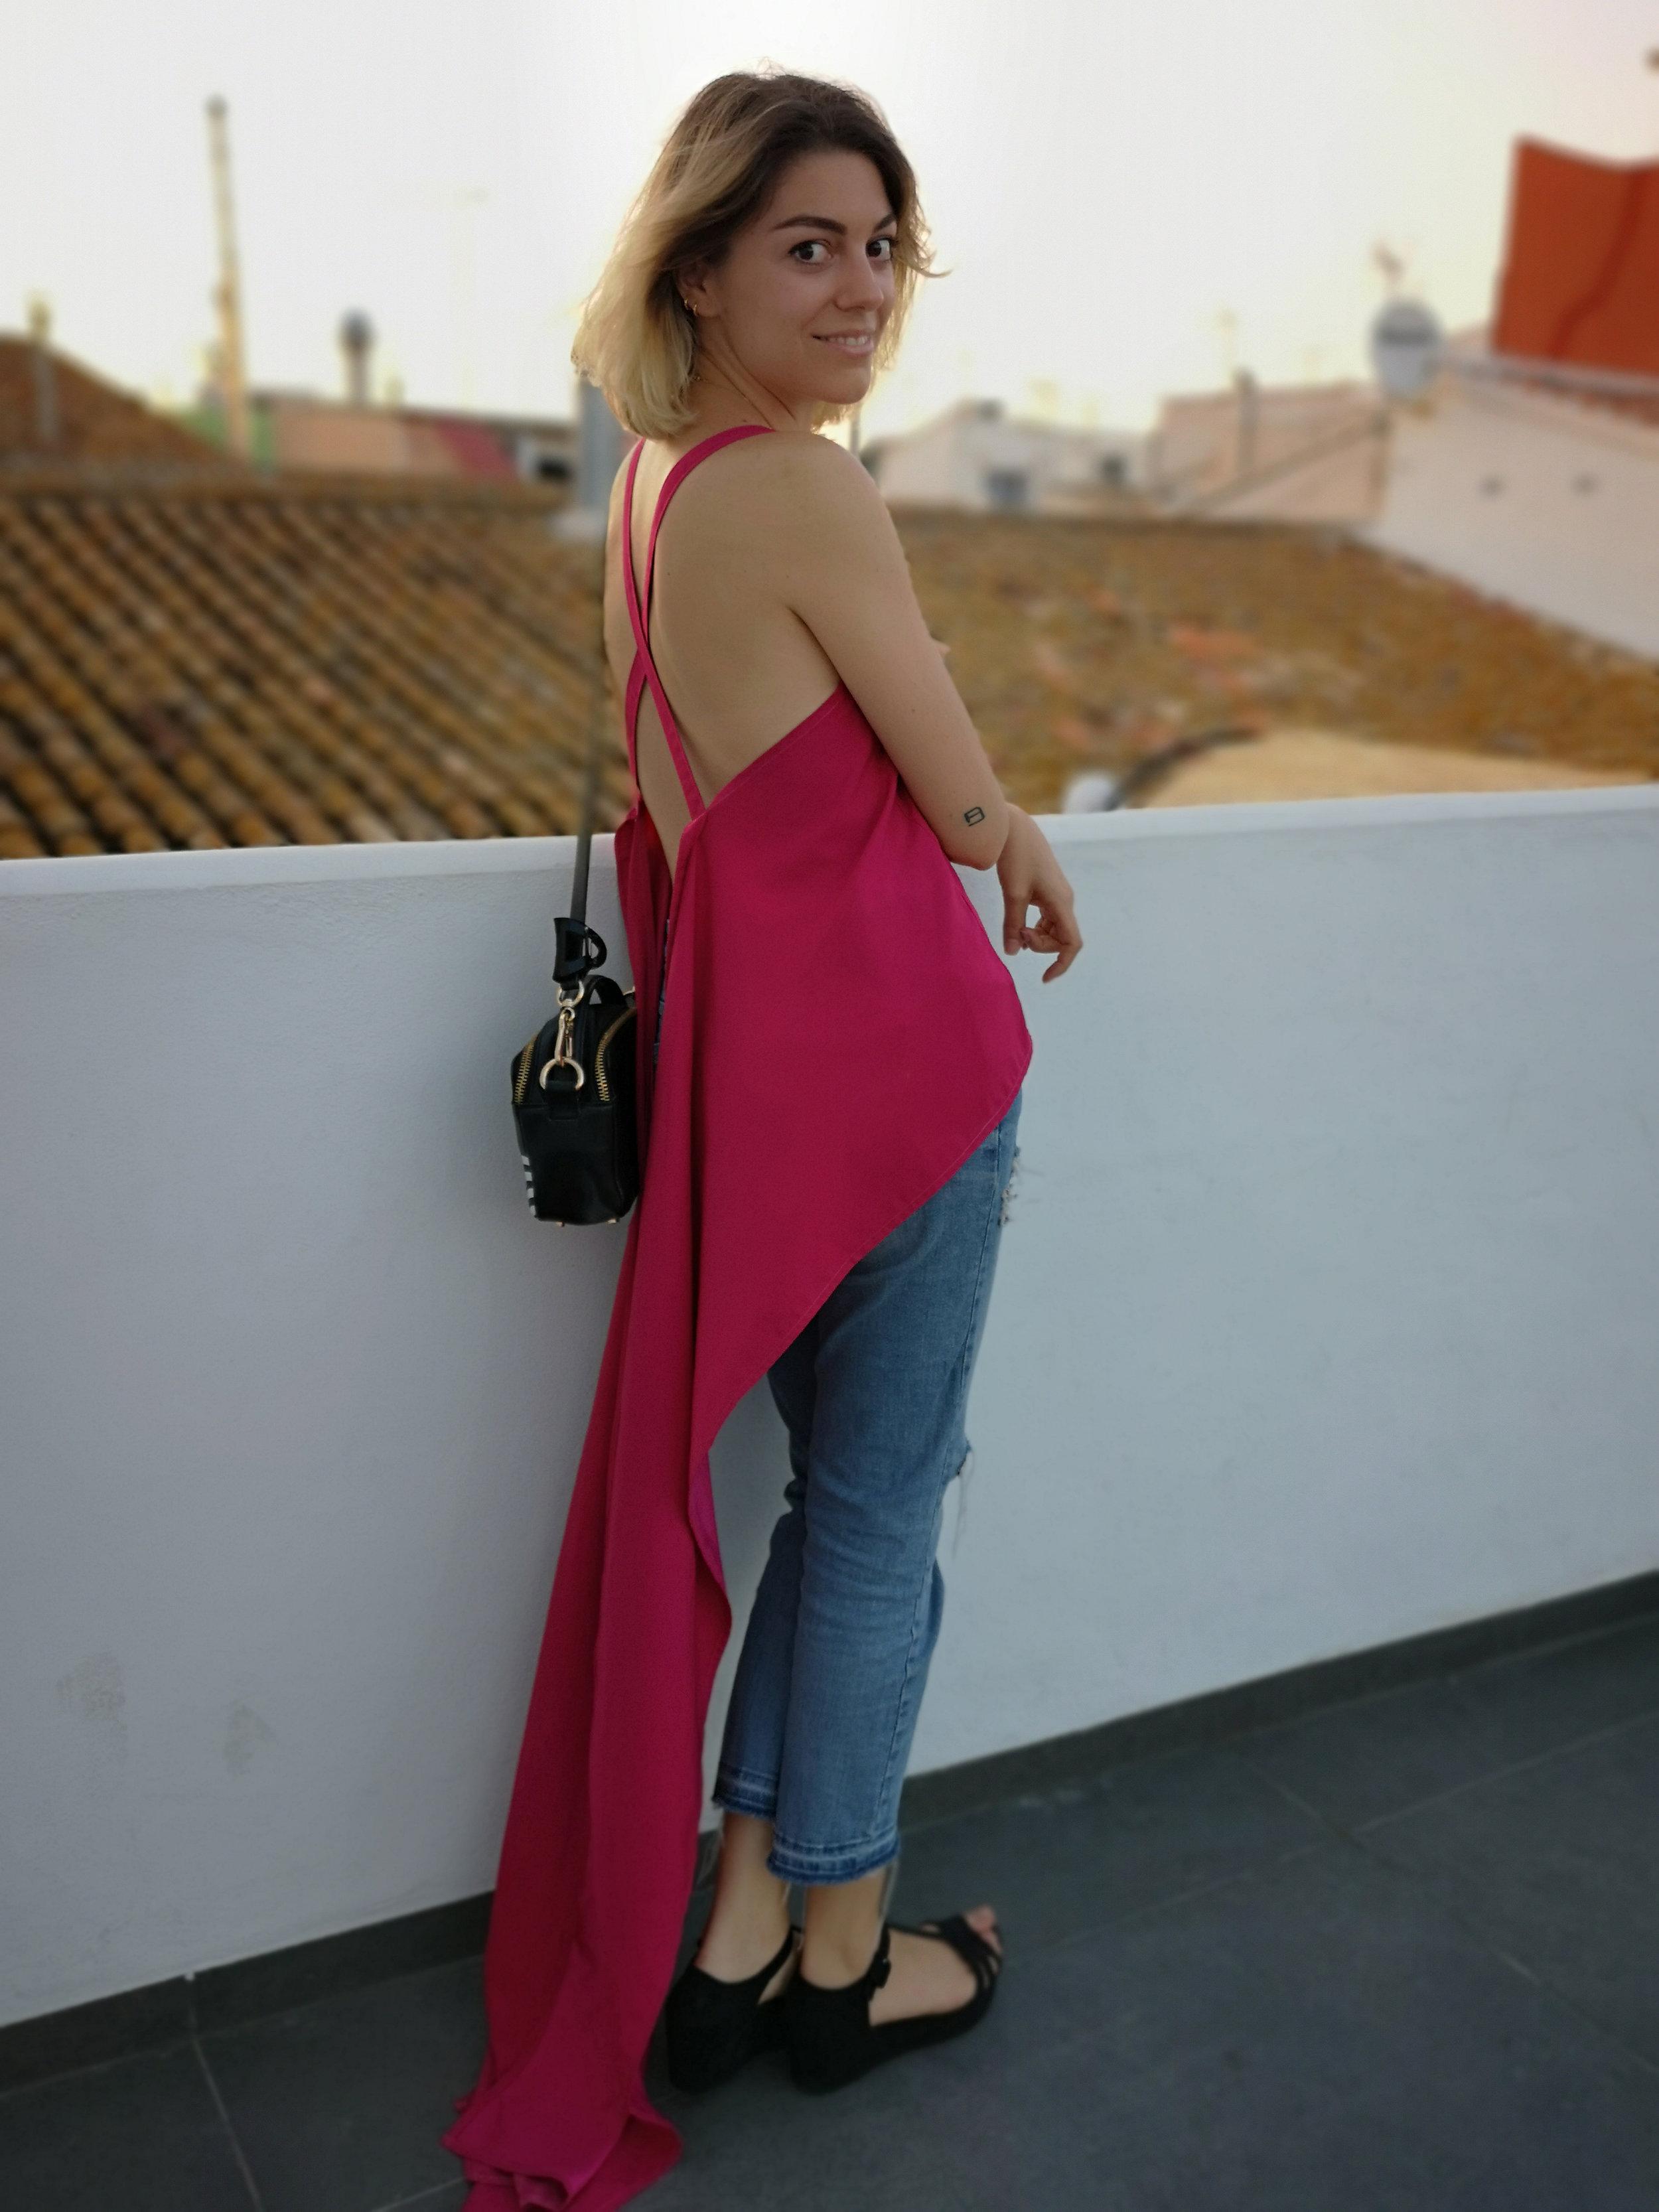 blusa-zero-waste-fucsia-estilismo-4-terraza-els-magazino-denia-rebervere.jpg